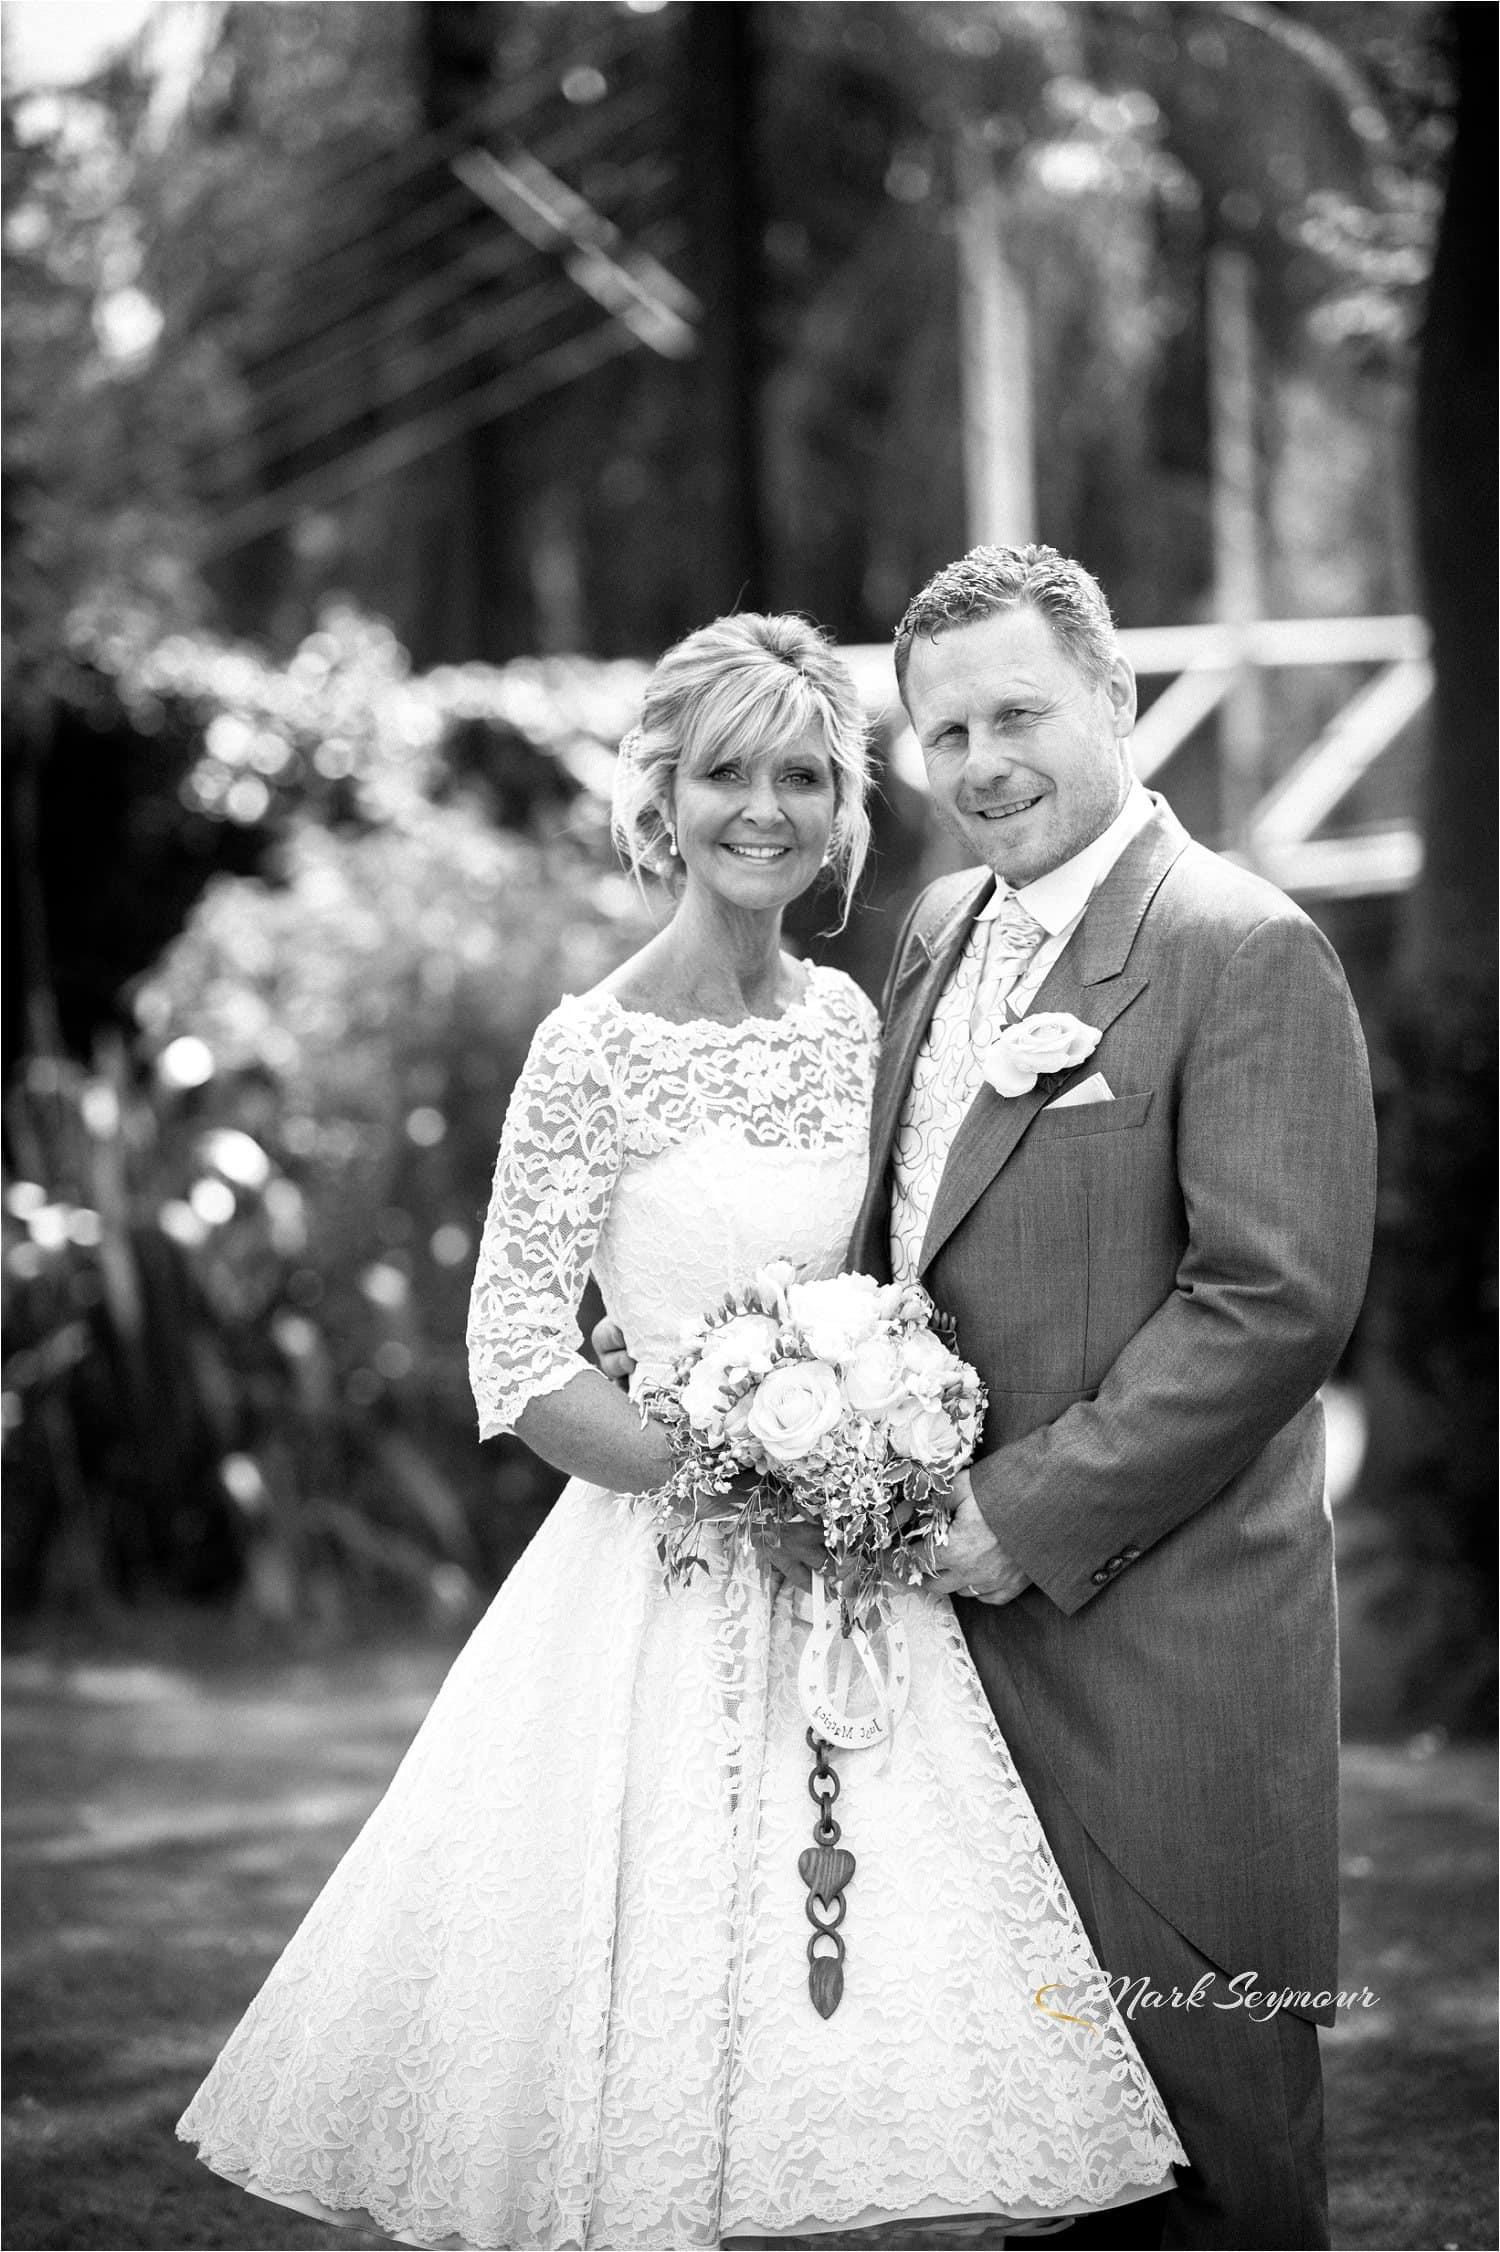 Elizabeth keenan wedding